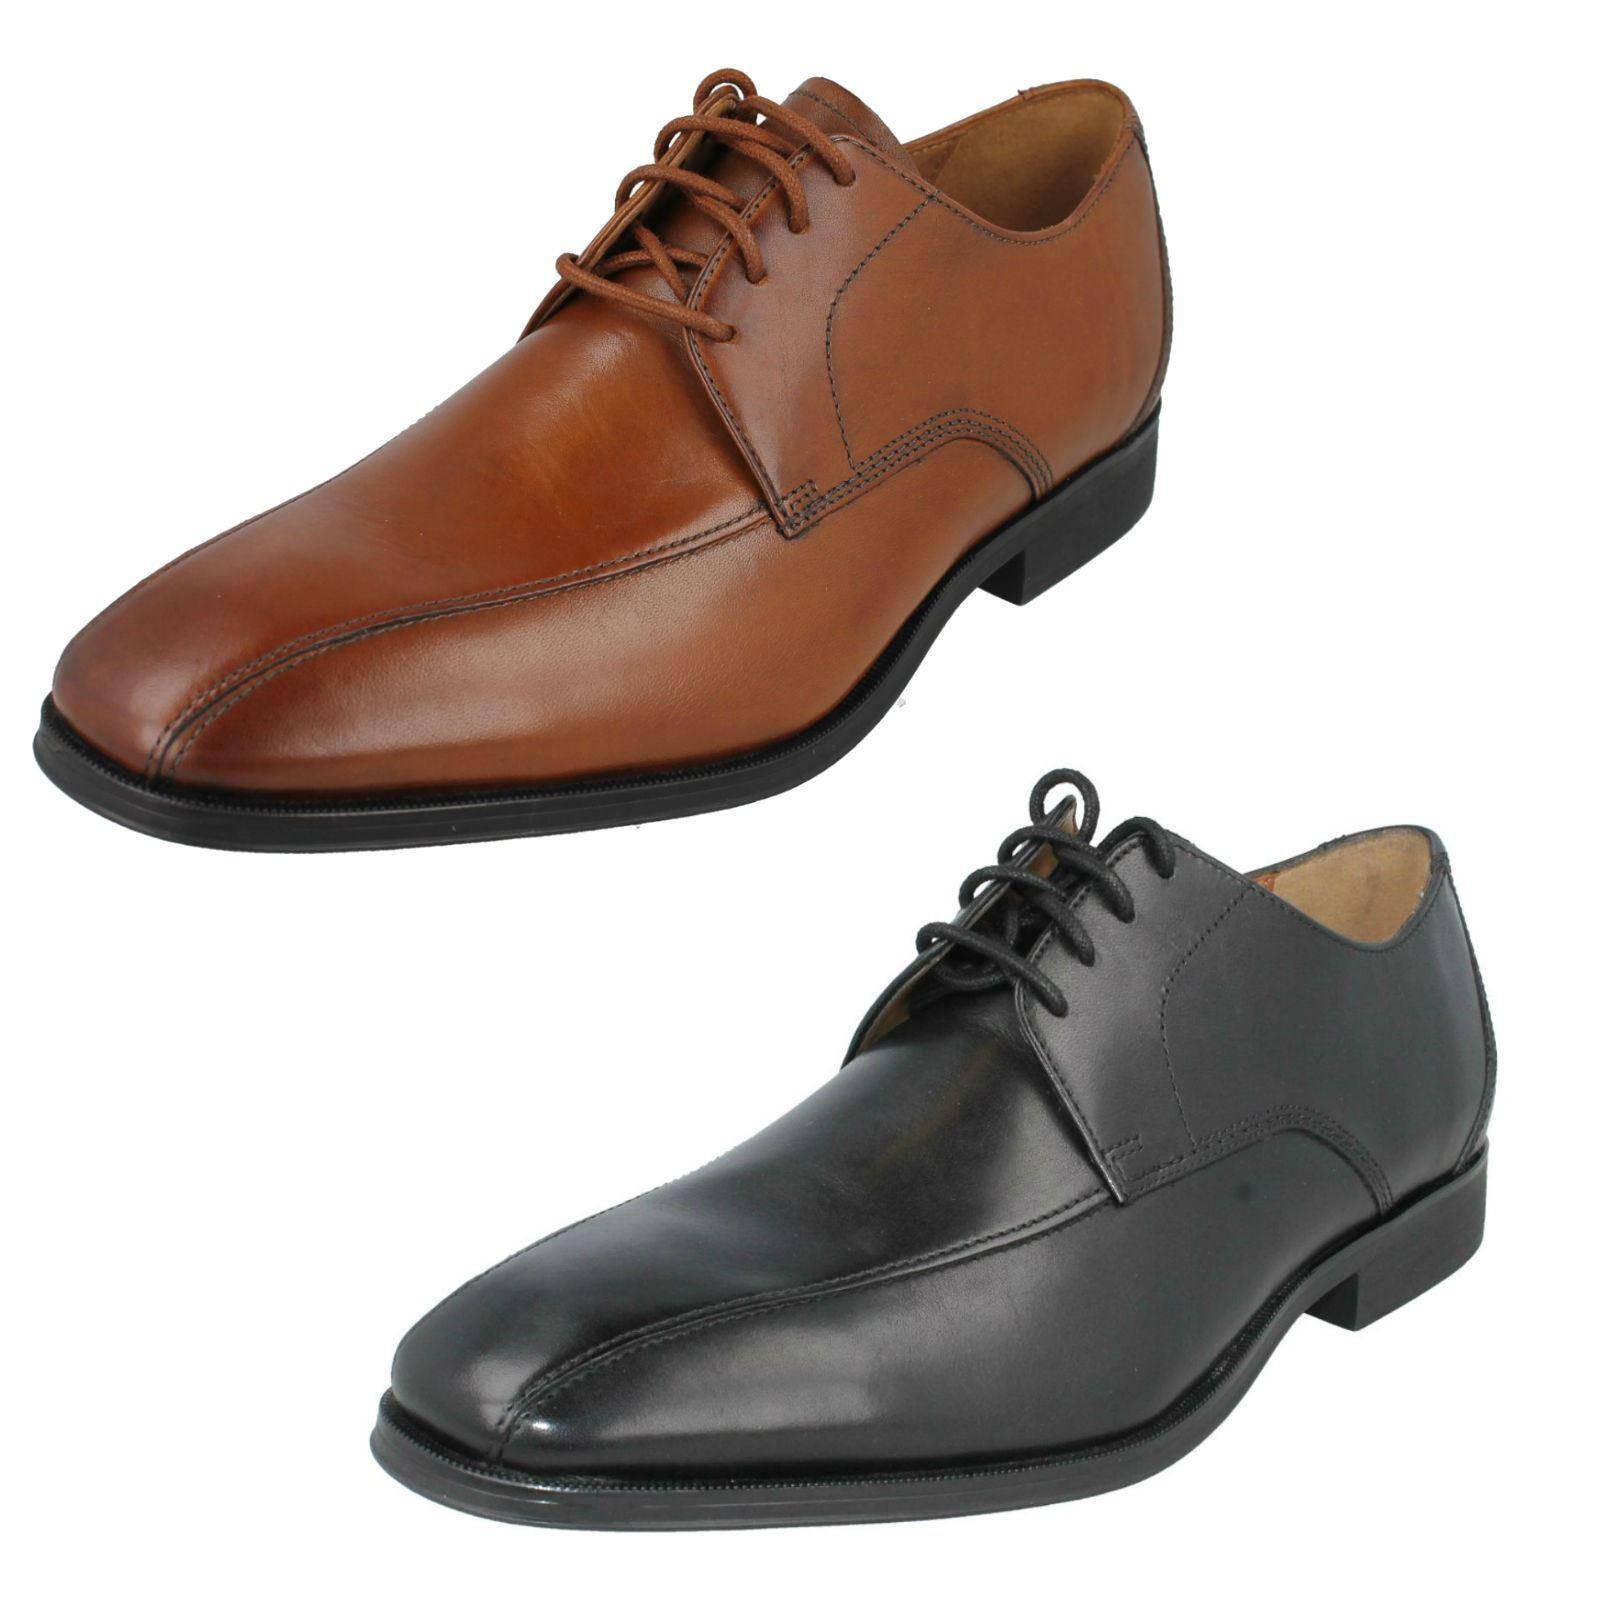 Clarks Mens Formal shoes 'Gilman Mode'